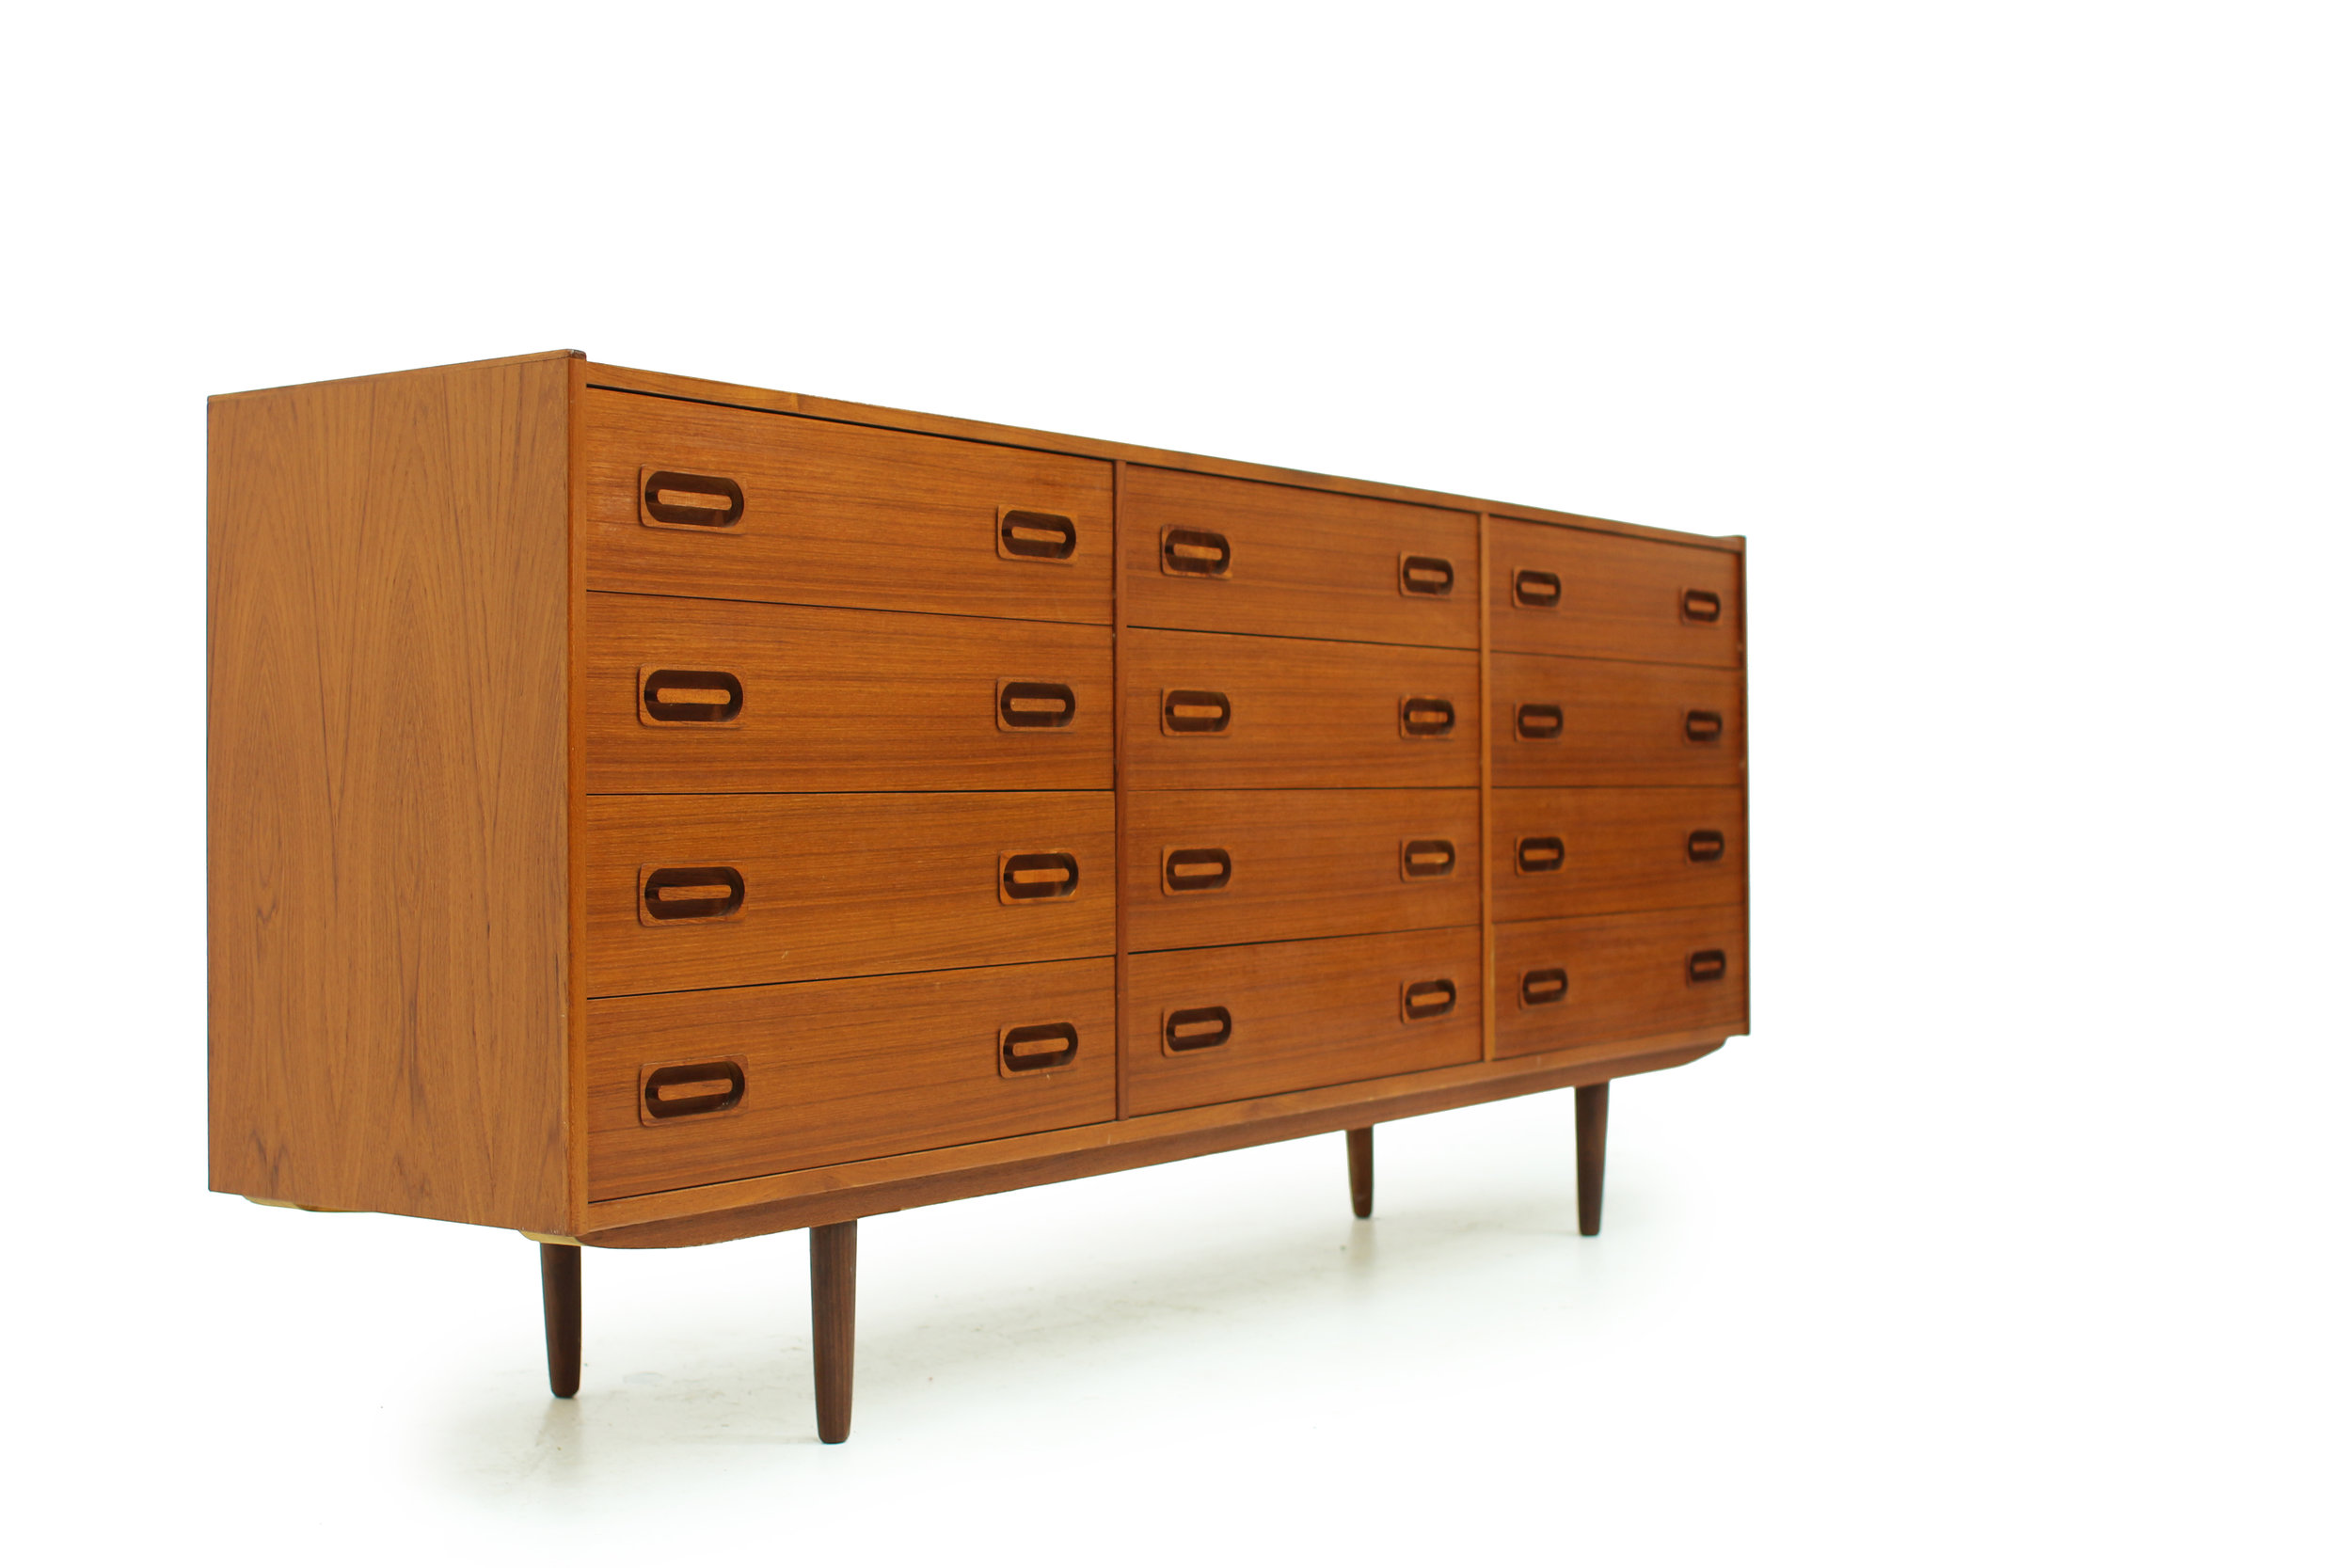 Danish Teak 12 Drawer Dresser by Dyrlund (5).jpg